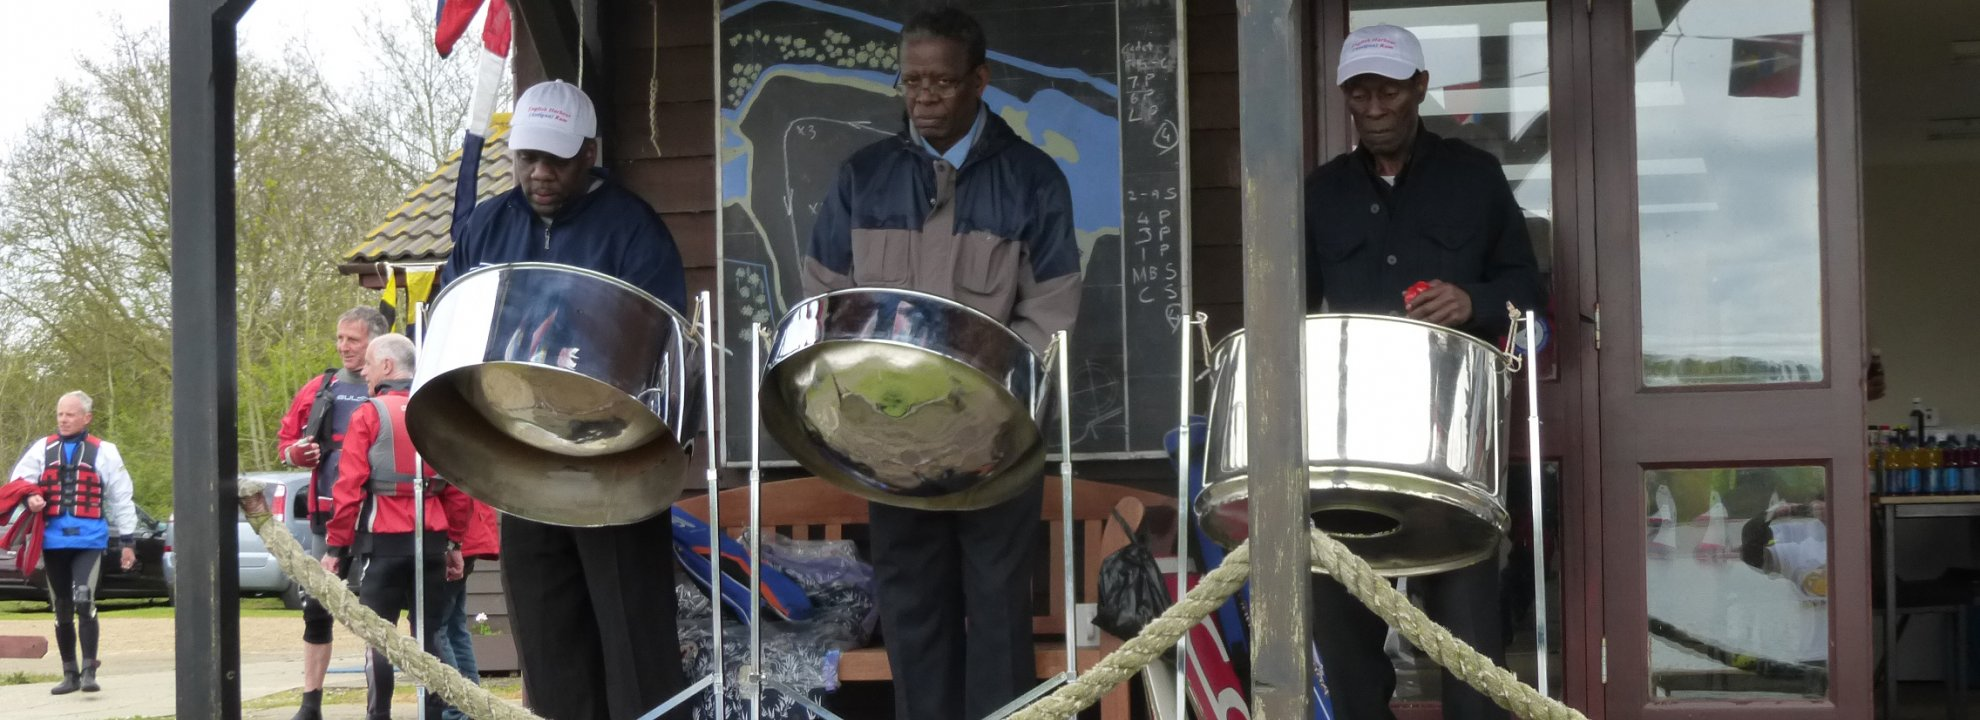 SESCA's Rescheduled '8th Antigua Sailing Day Regatta' Banner